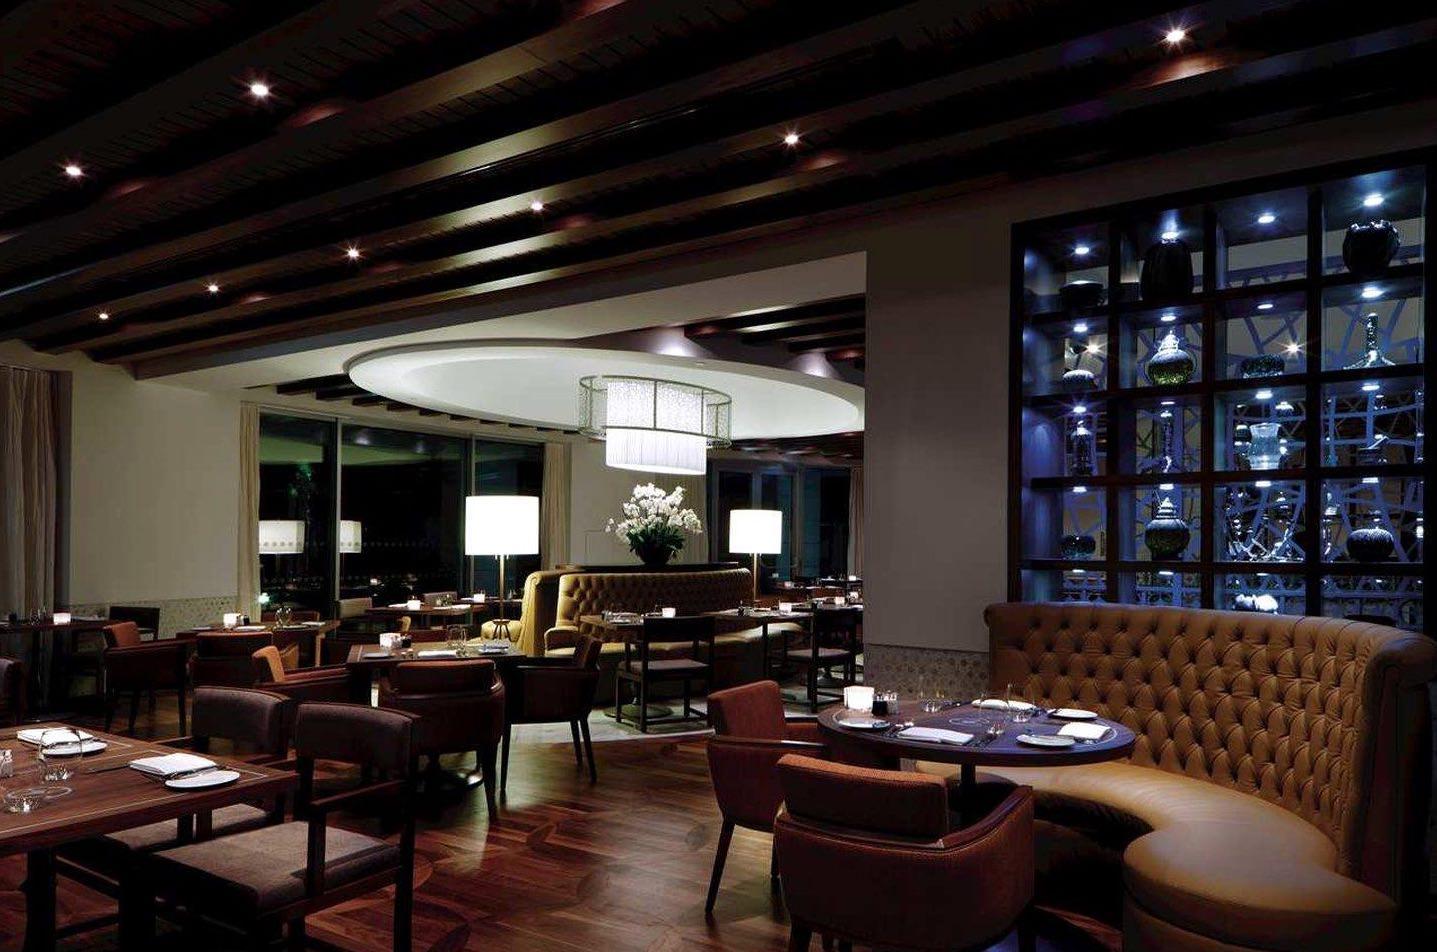 conrad_algarve_restaurant4.jpg